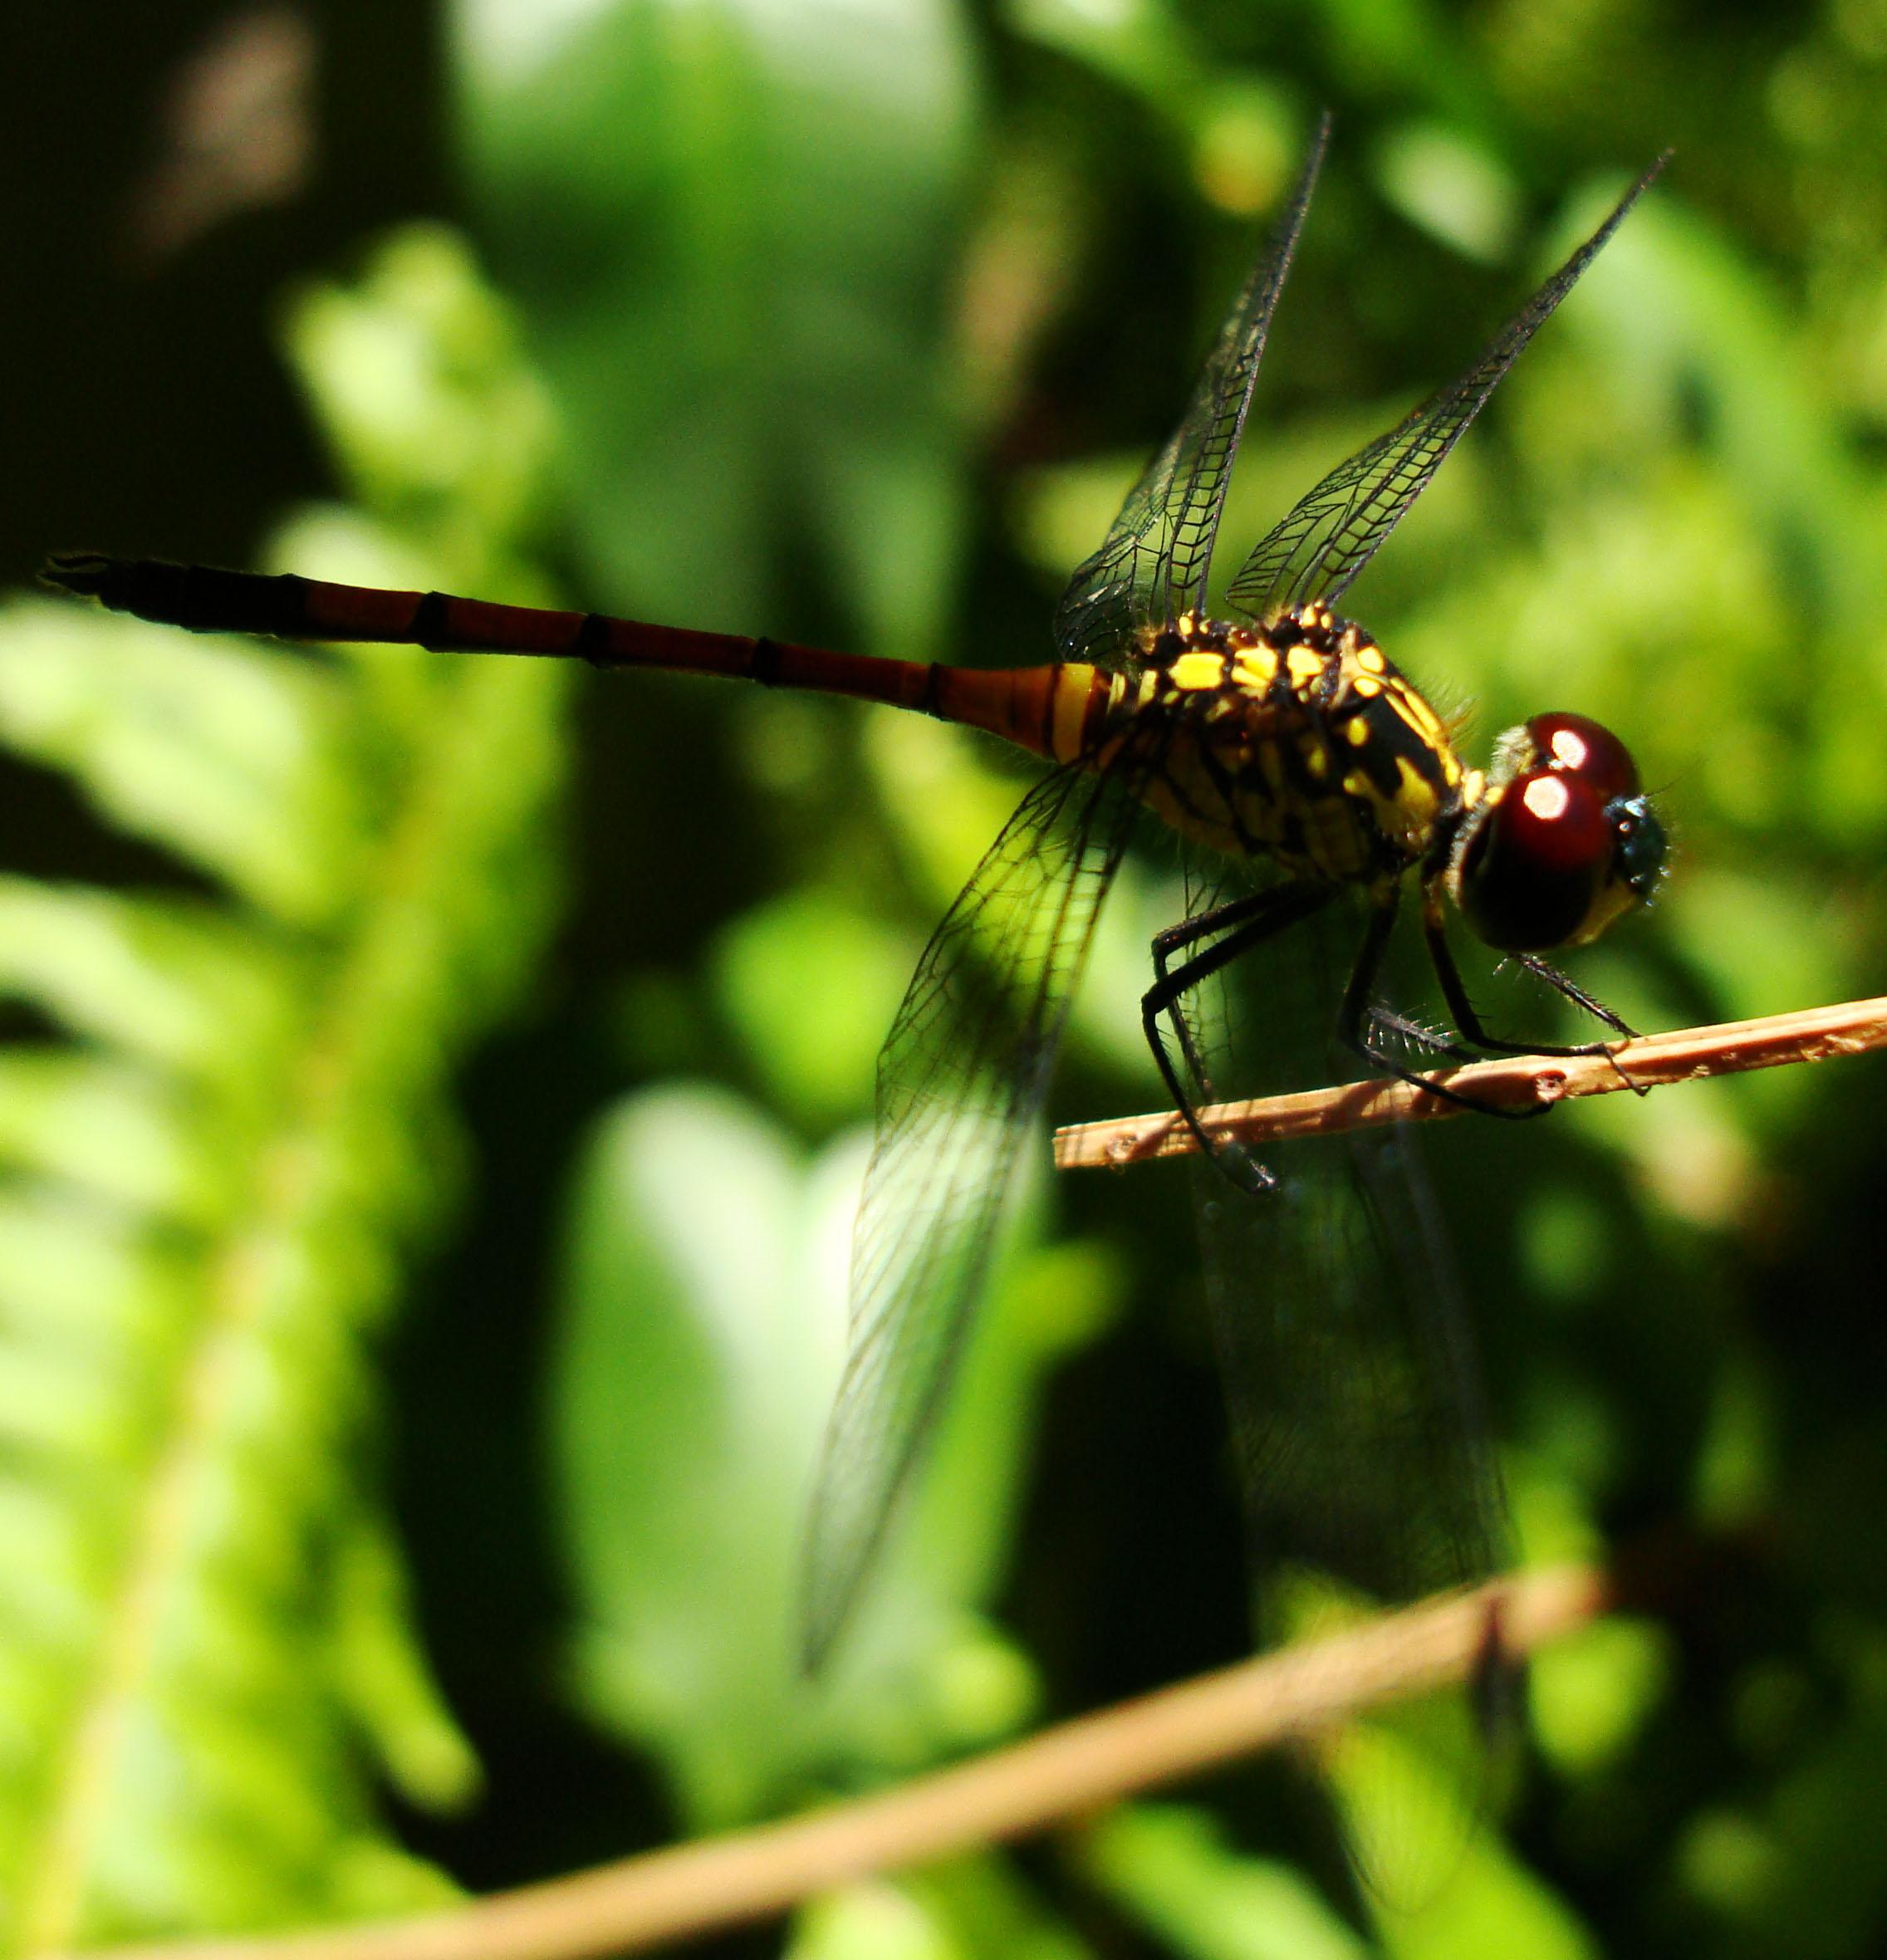 Libellulidae Red Swampdragon Agrionoptera insignis allogenes Sunshine Coast Qld Australia 132